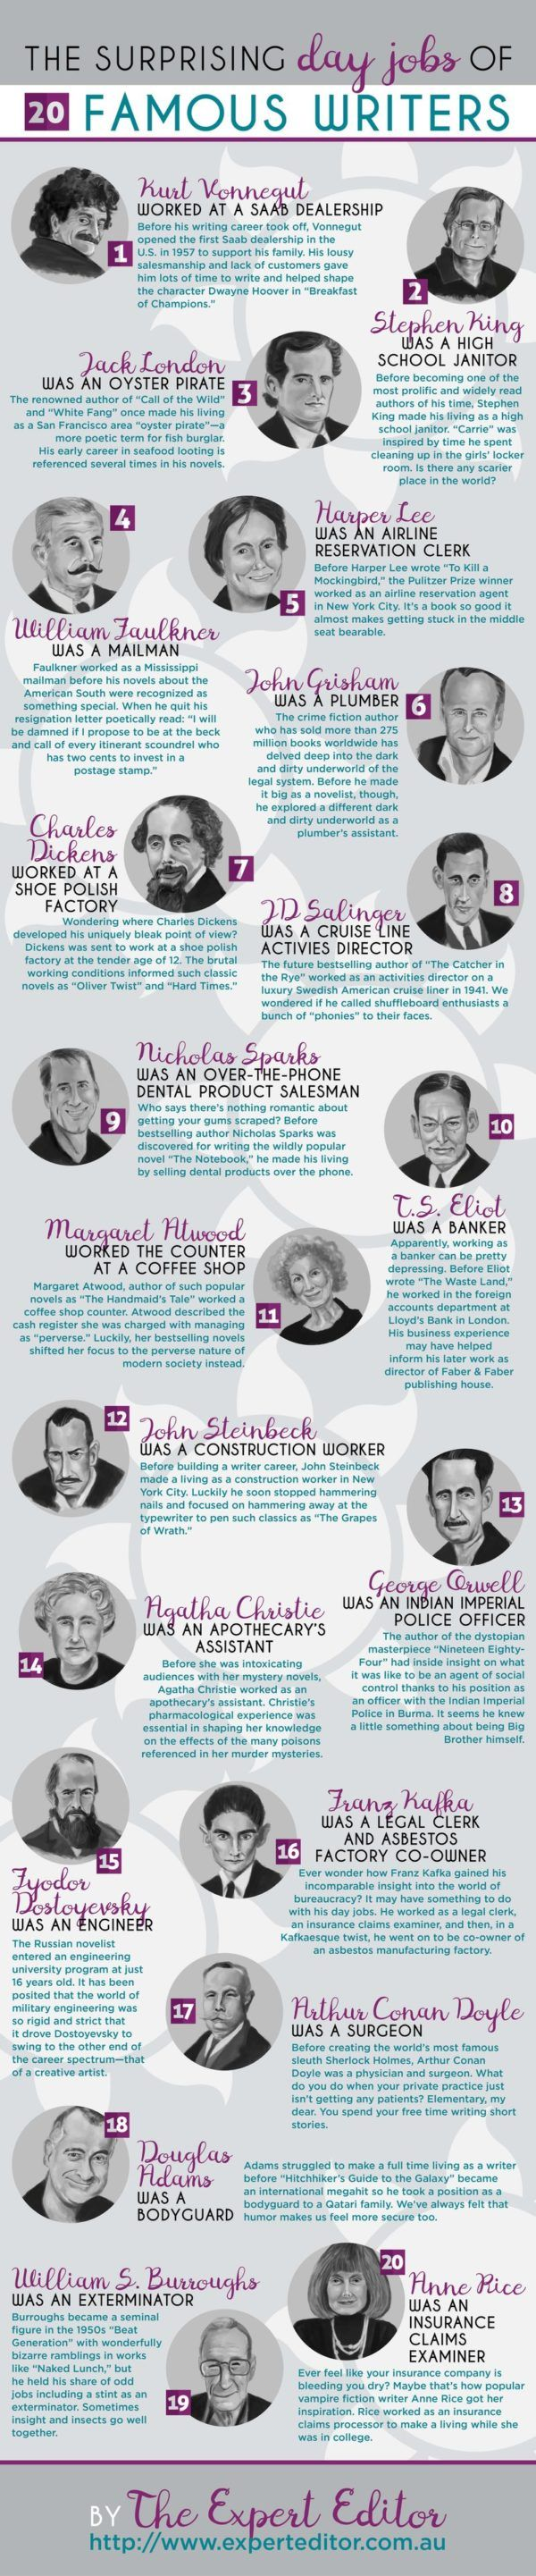 Douglas Adams was a bodyguard, John Grisham was a plumber #Infographic